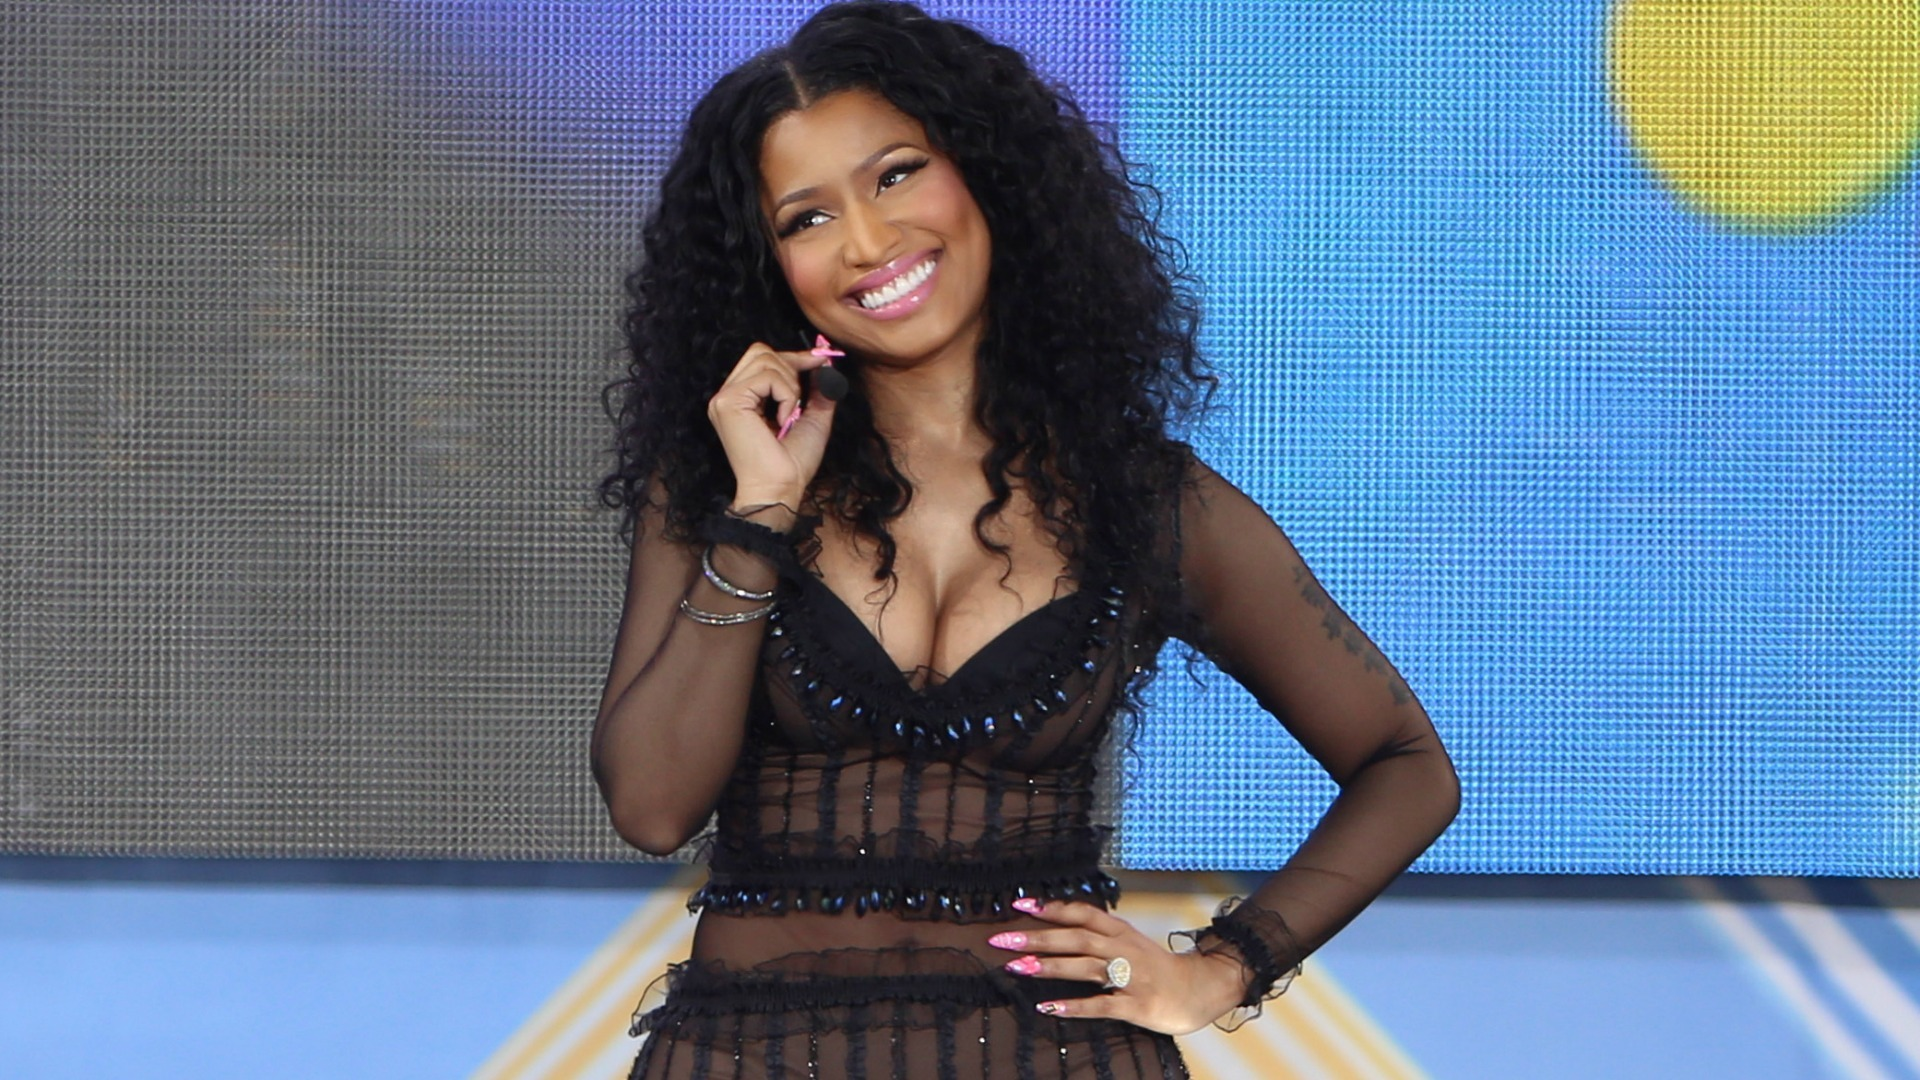 Nicki Minaj Background